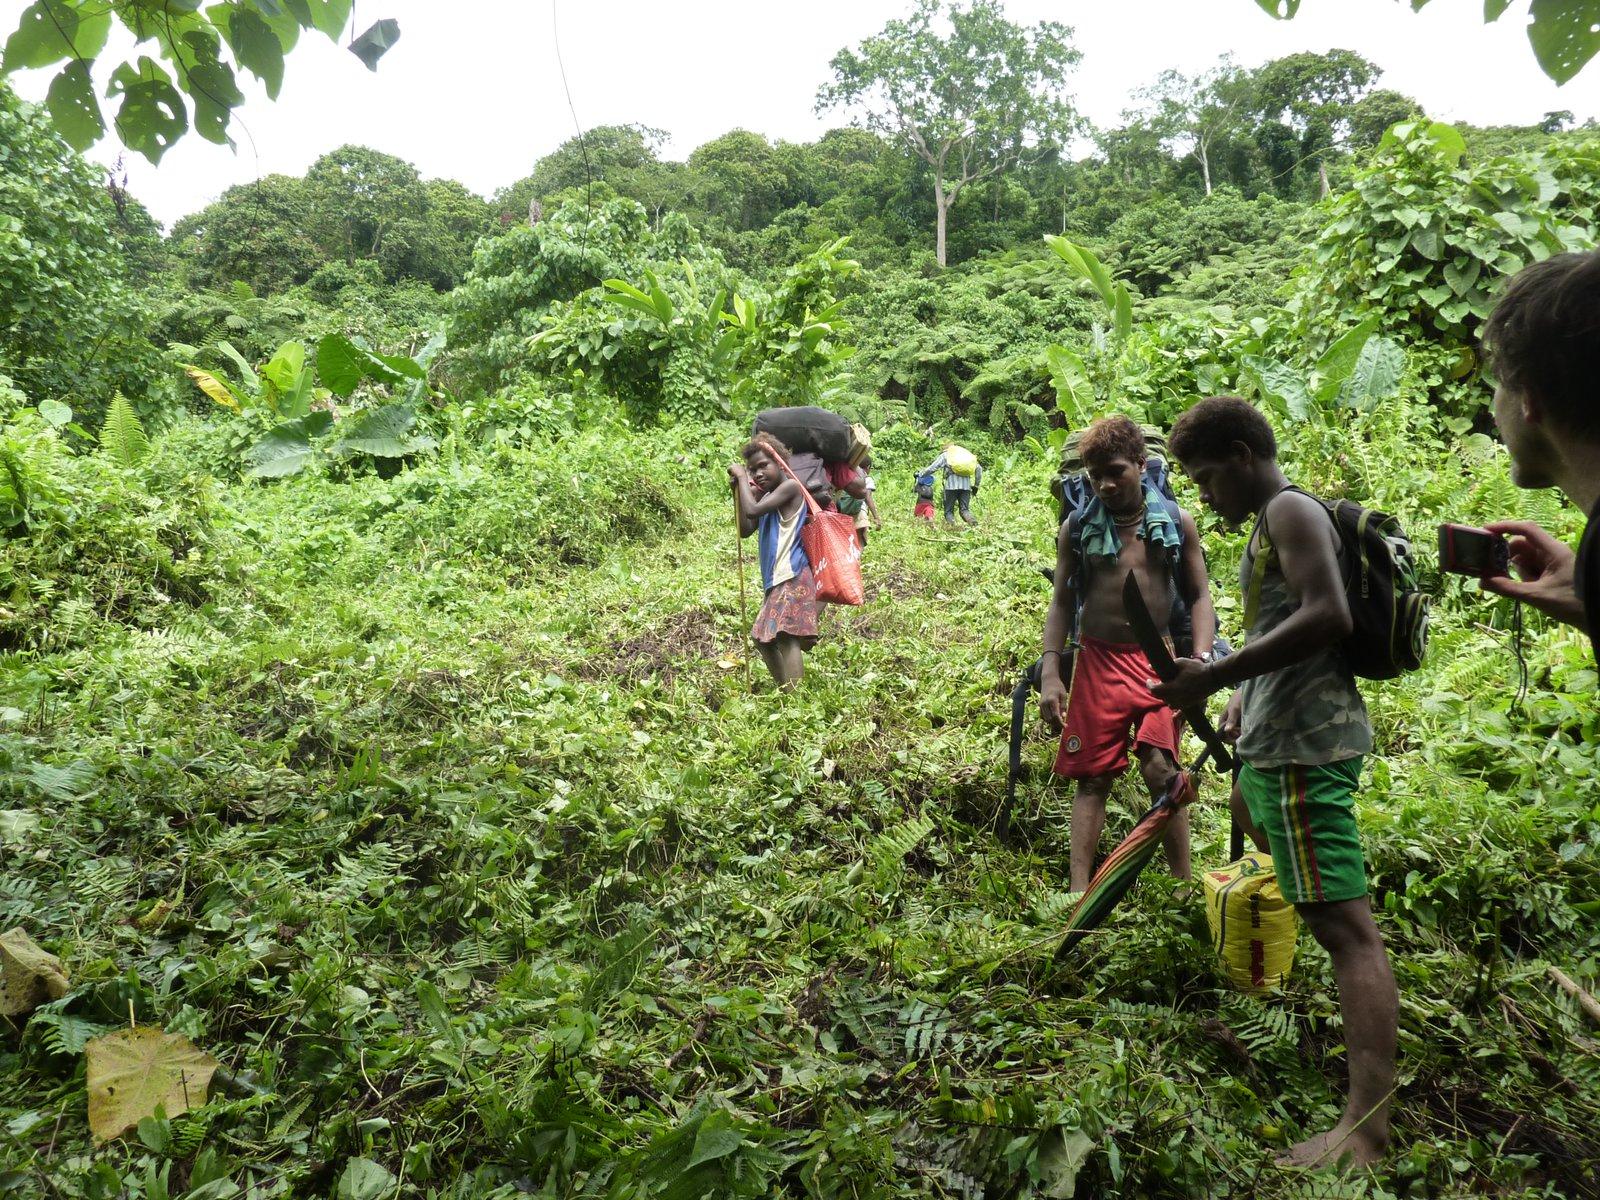 The steep climb up to Kwainaa'isi, Malaita.